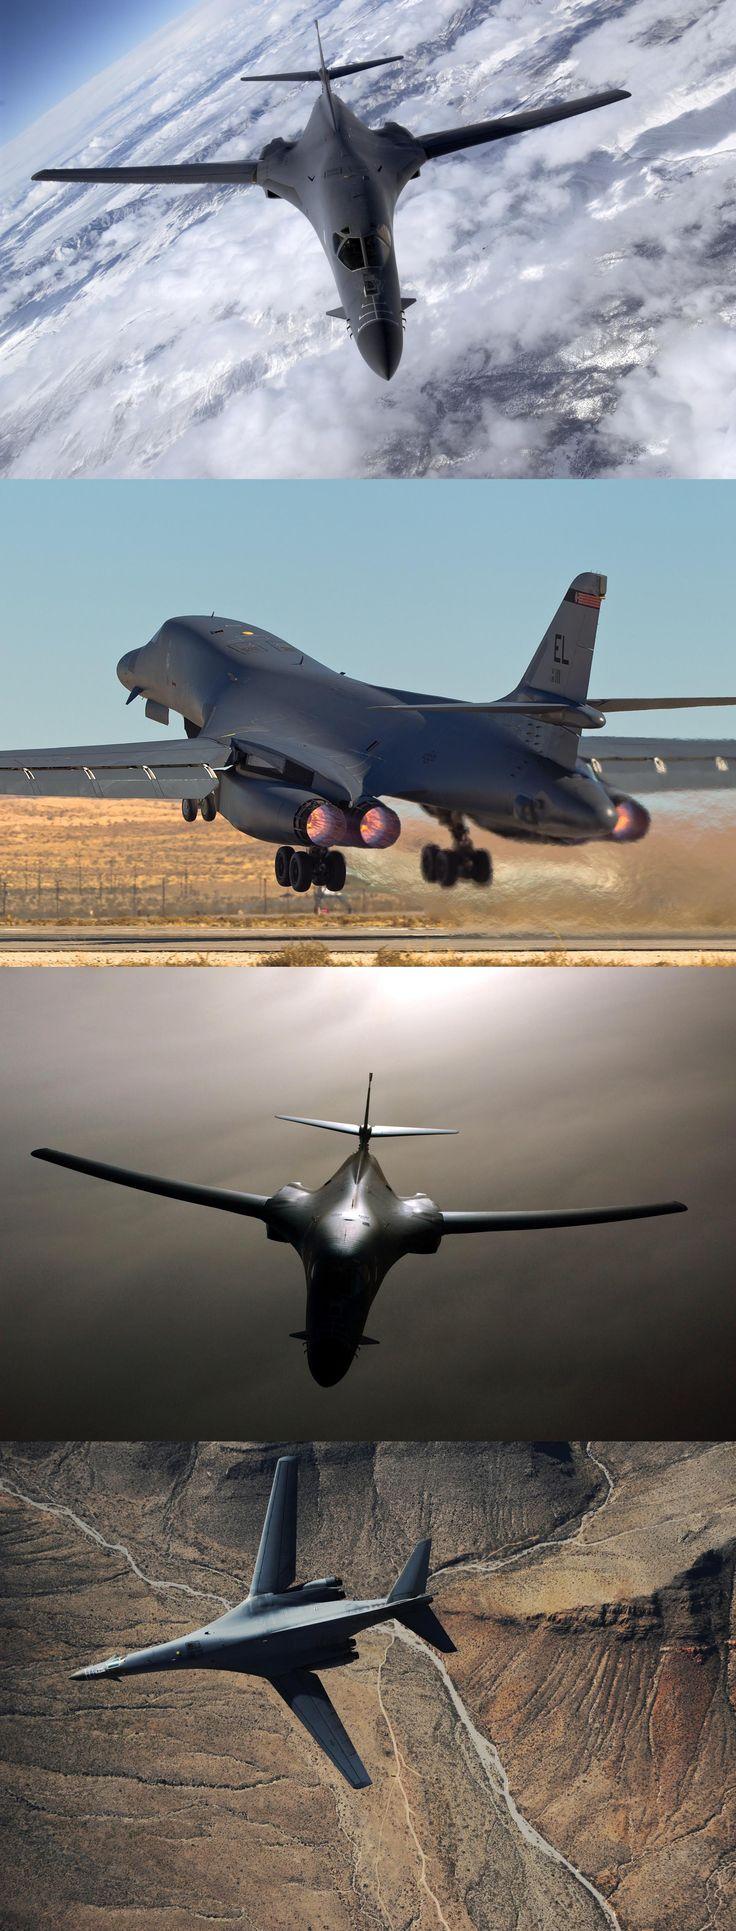 Plane, bomber, b-1b, lancer, nevada